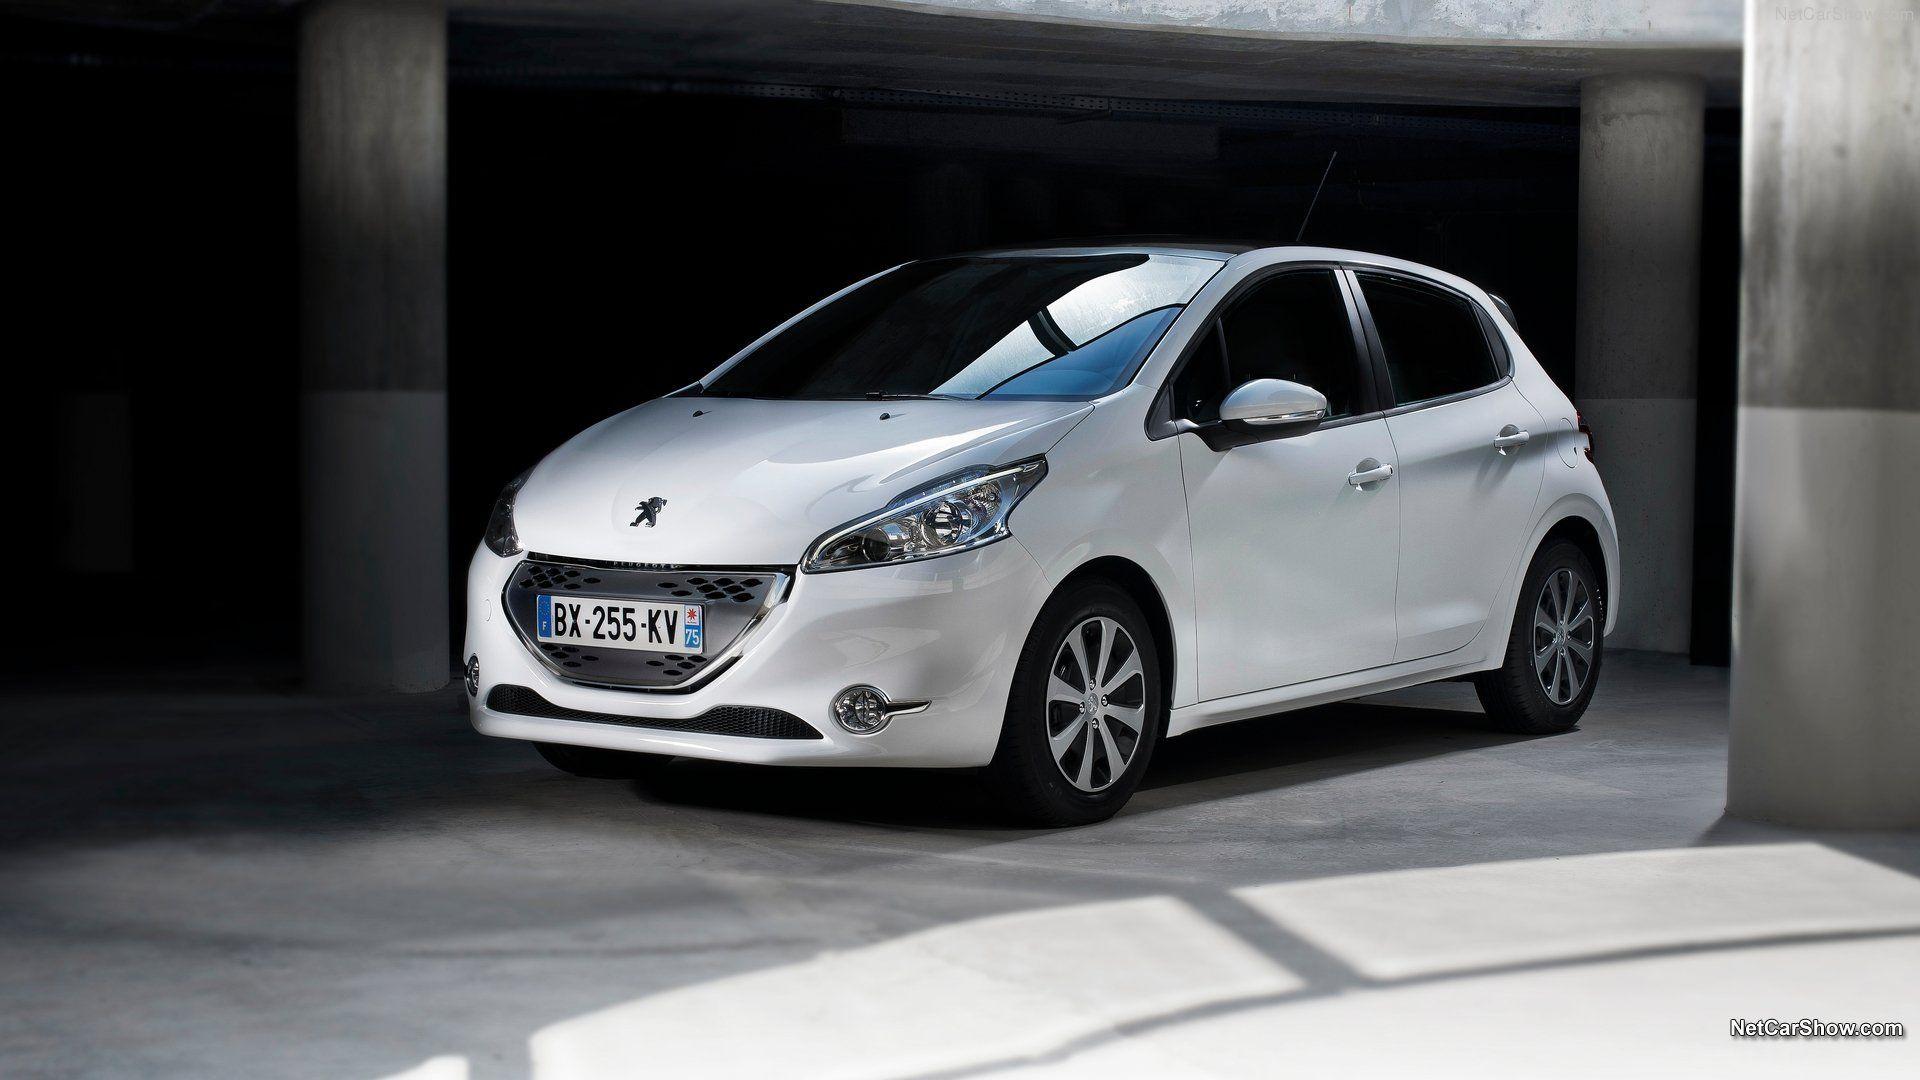 Peugeot 208 picture 15, MY 2013 Custom size generator